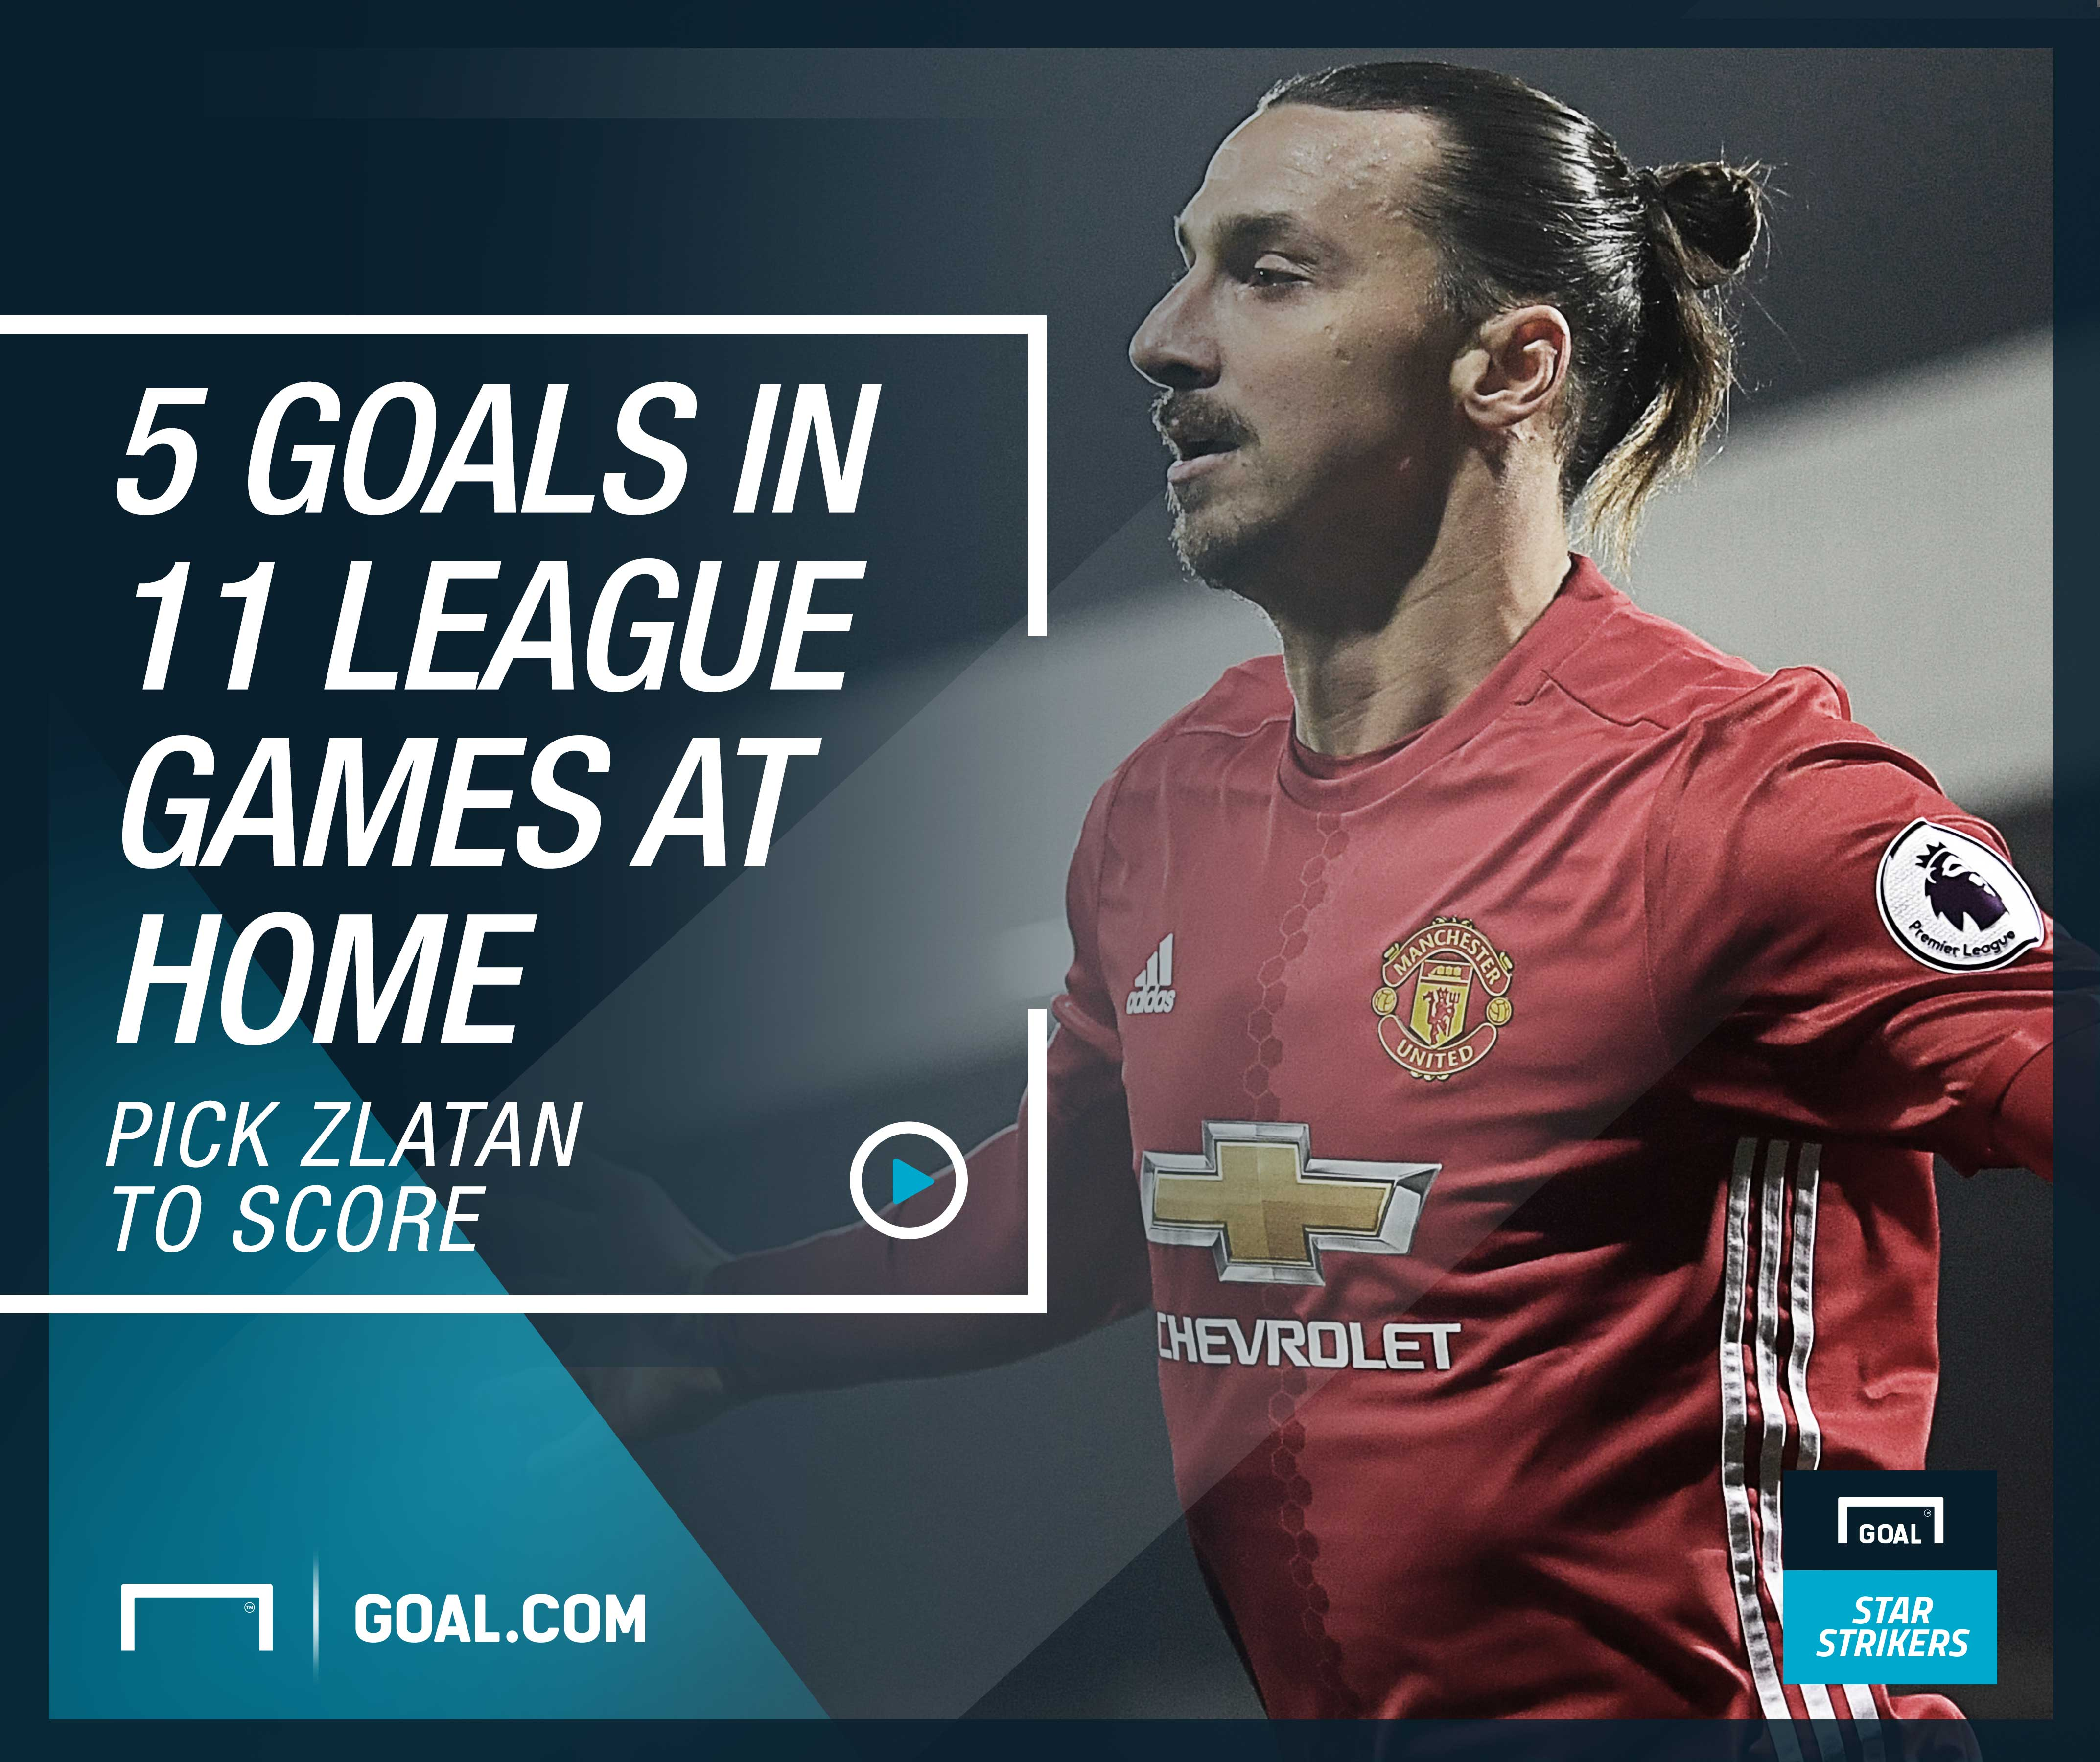 Goal Star Strikers - Zlatan